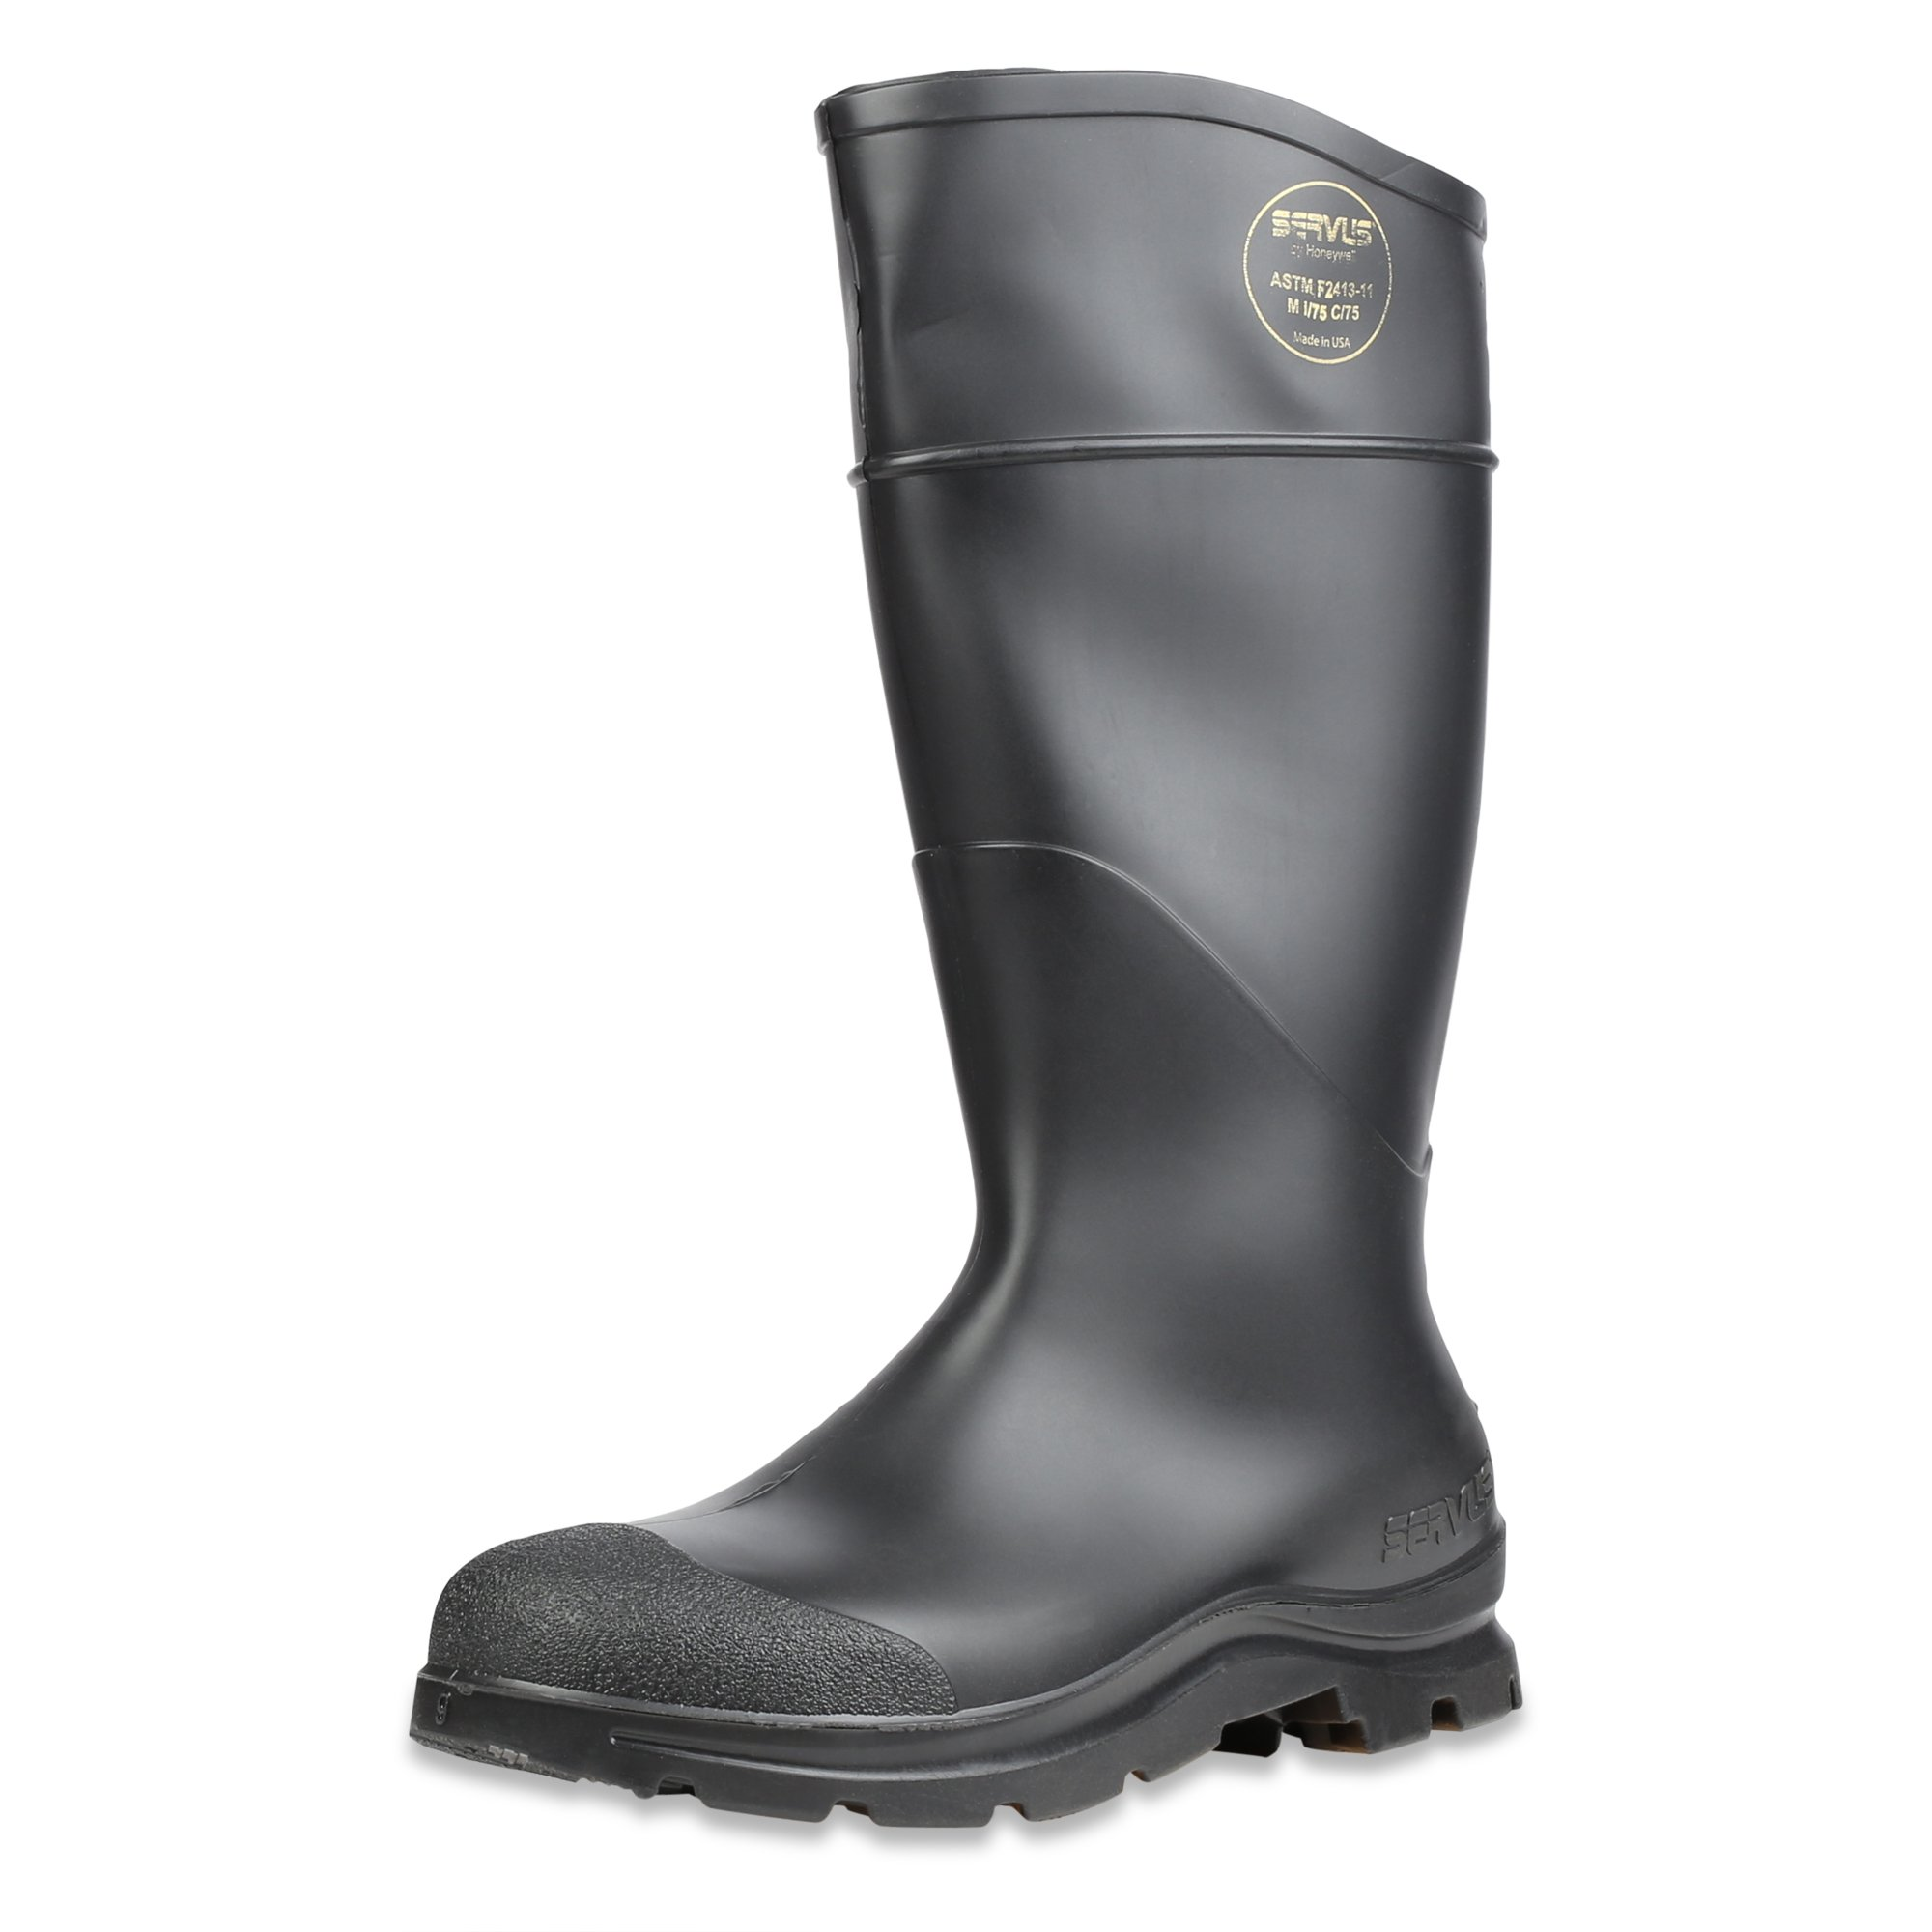 Servus Comfort Technology 14'' PVC Steel Toe Men's Work Boots, Black, Size 10 (18821) by SERVUS